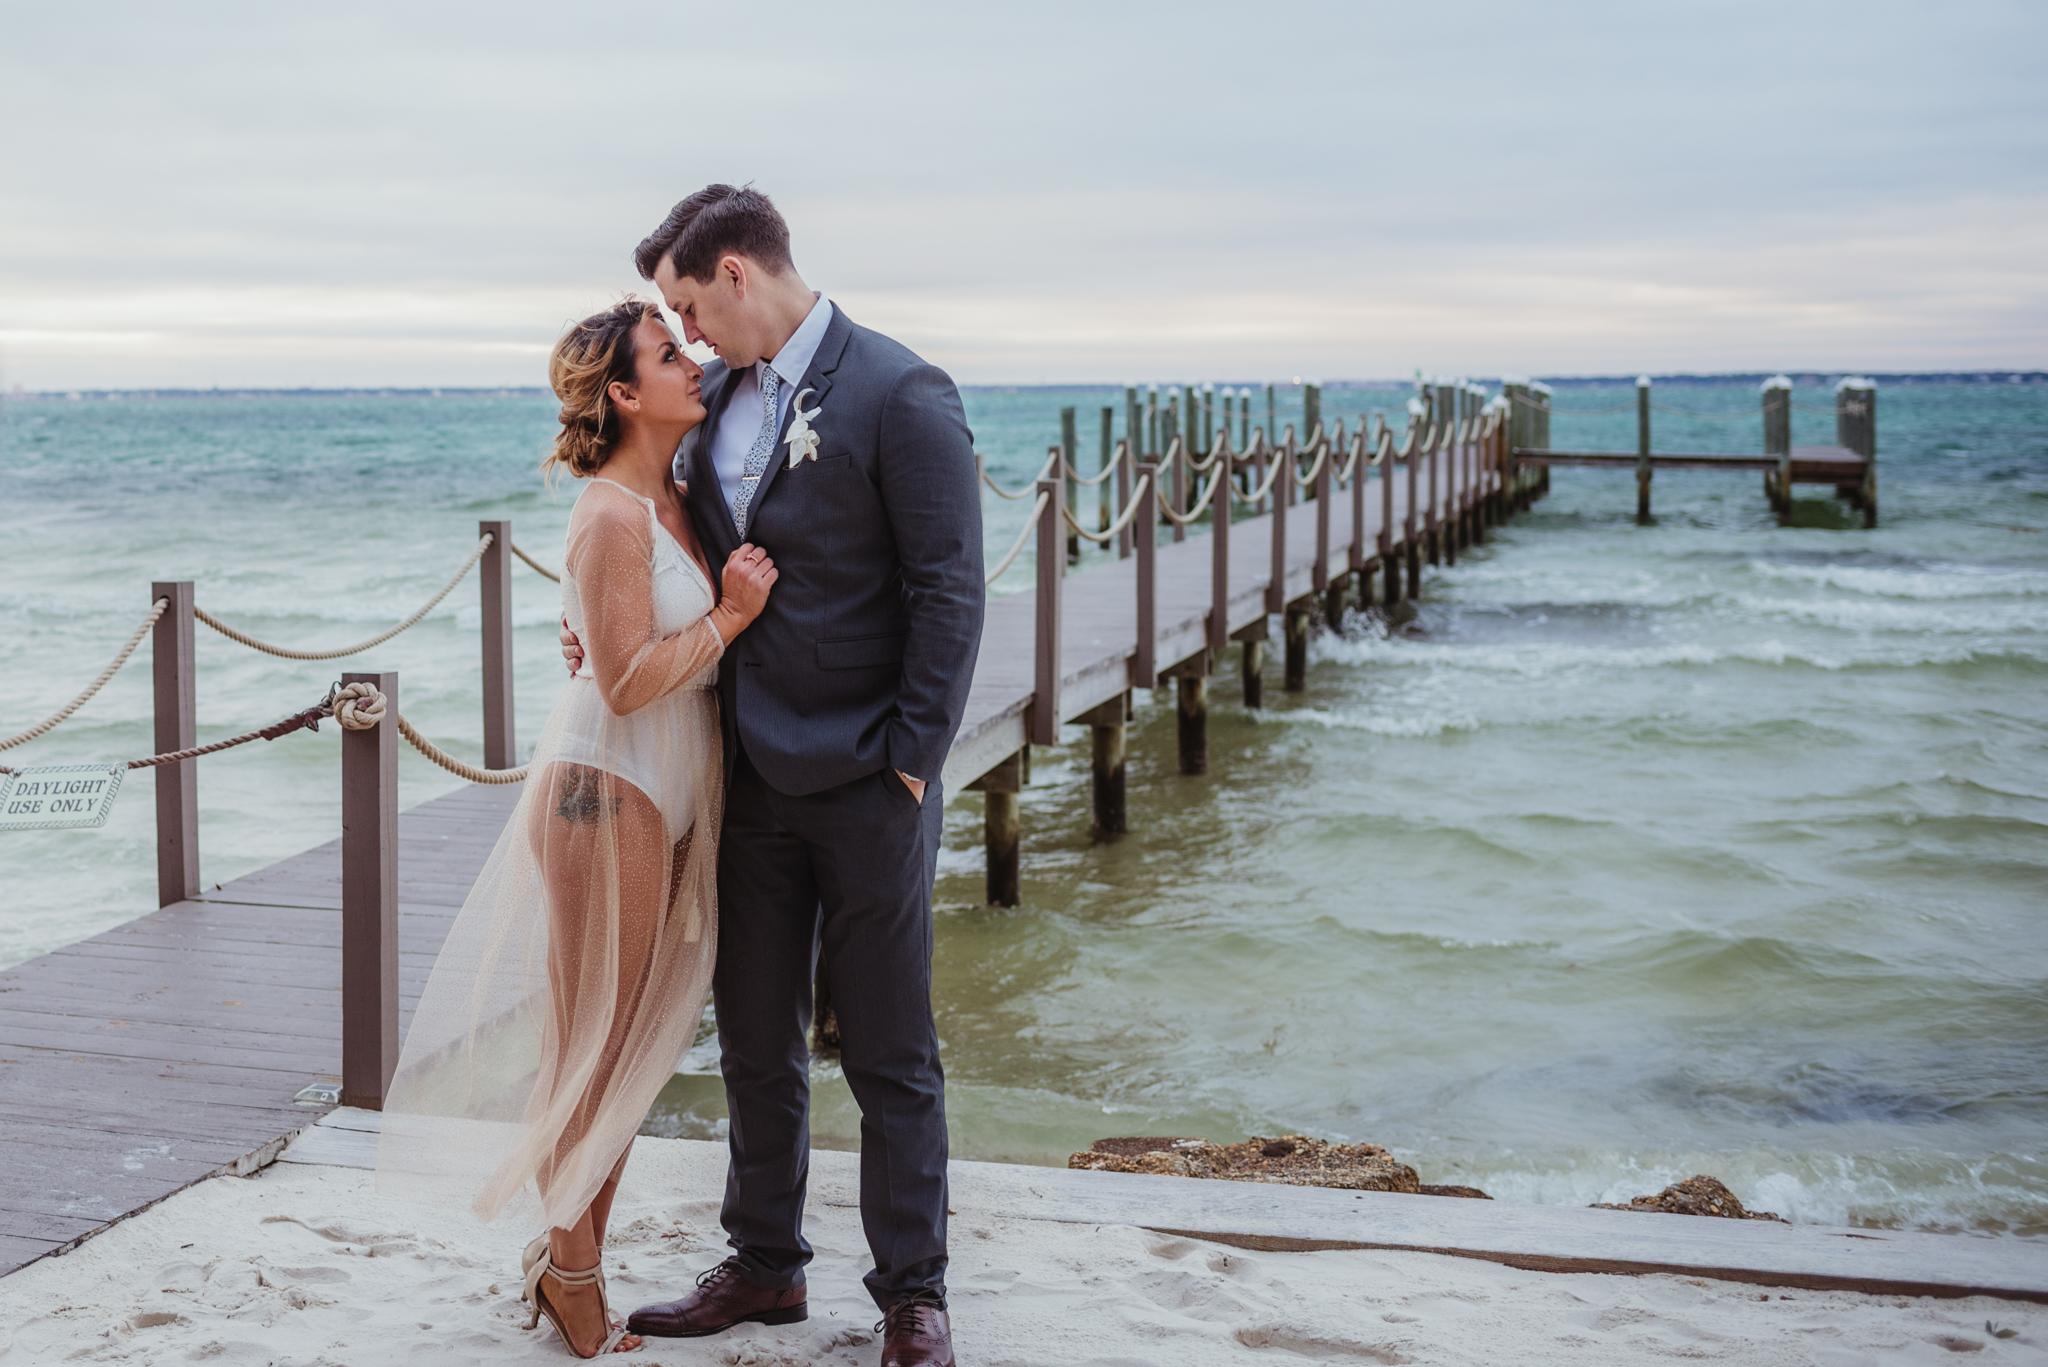 Raleigh-wedding-photography-beach-wedding-portraits-8.jpg